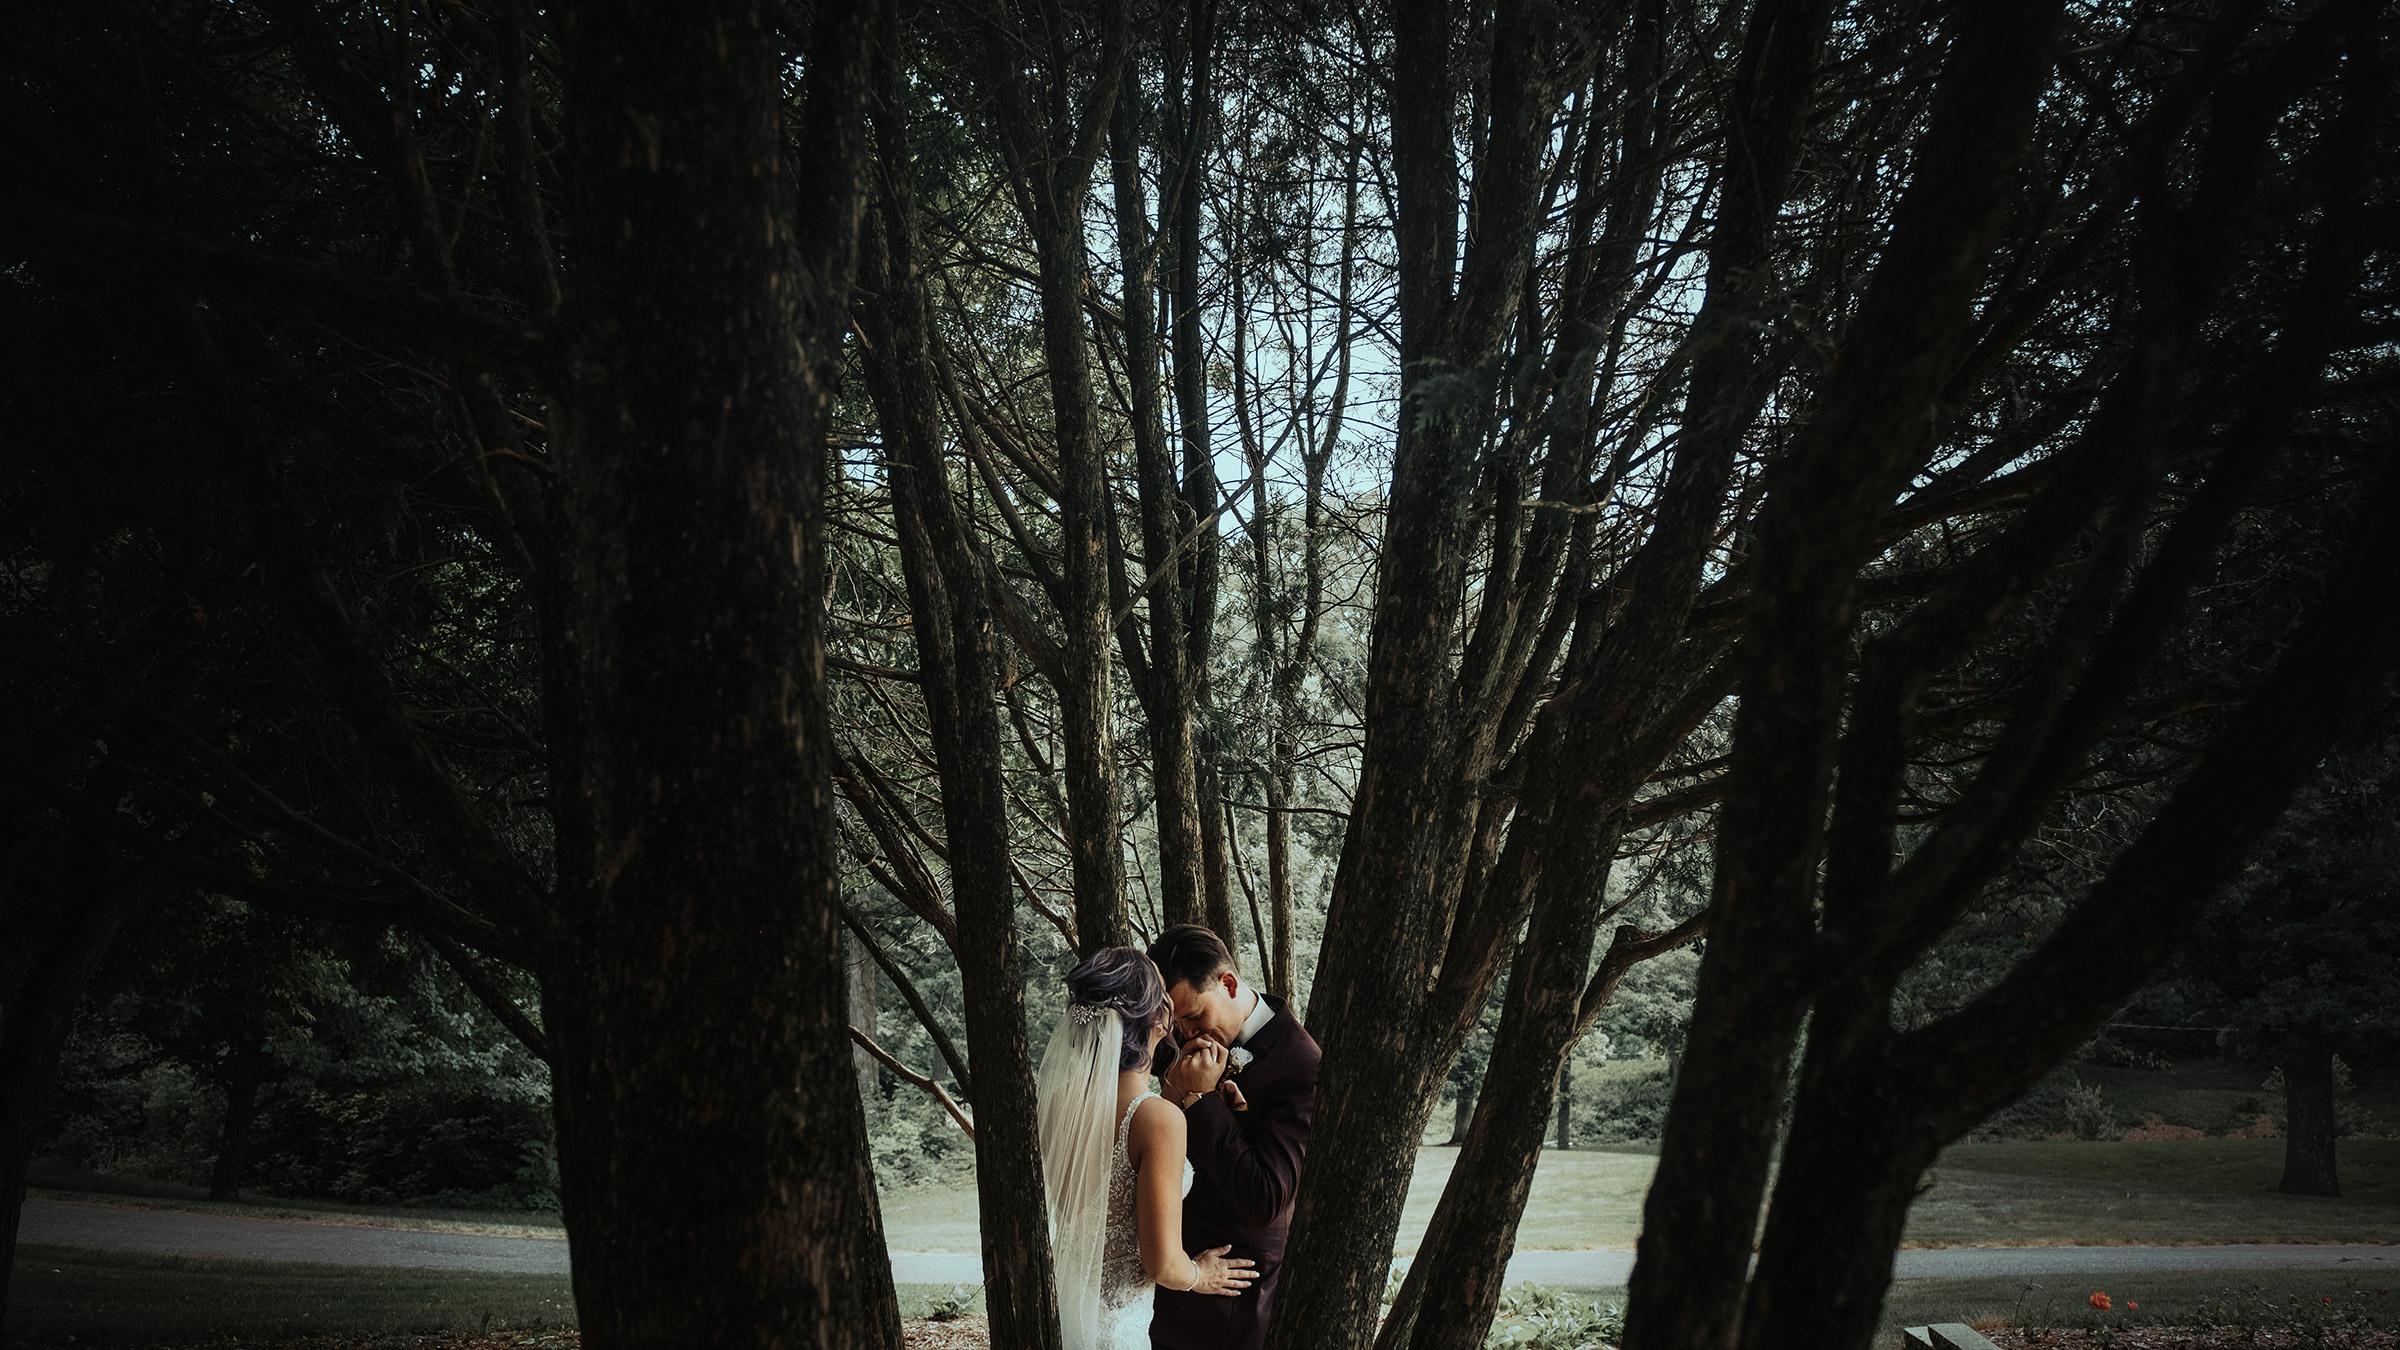 groom-kissing-brides-hand-in-rose-garden-desmoines-iowa-art-center-raelyn-ramey-photography.jpg